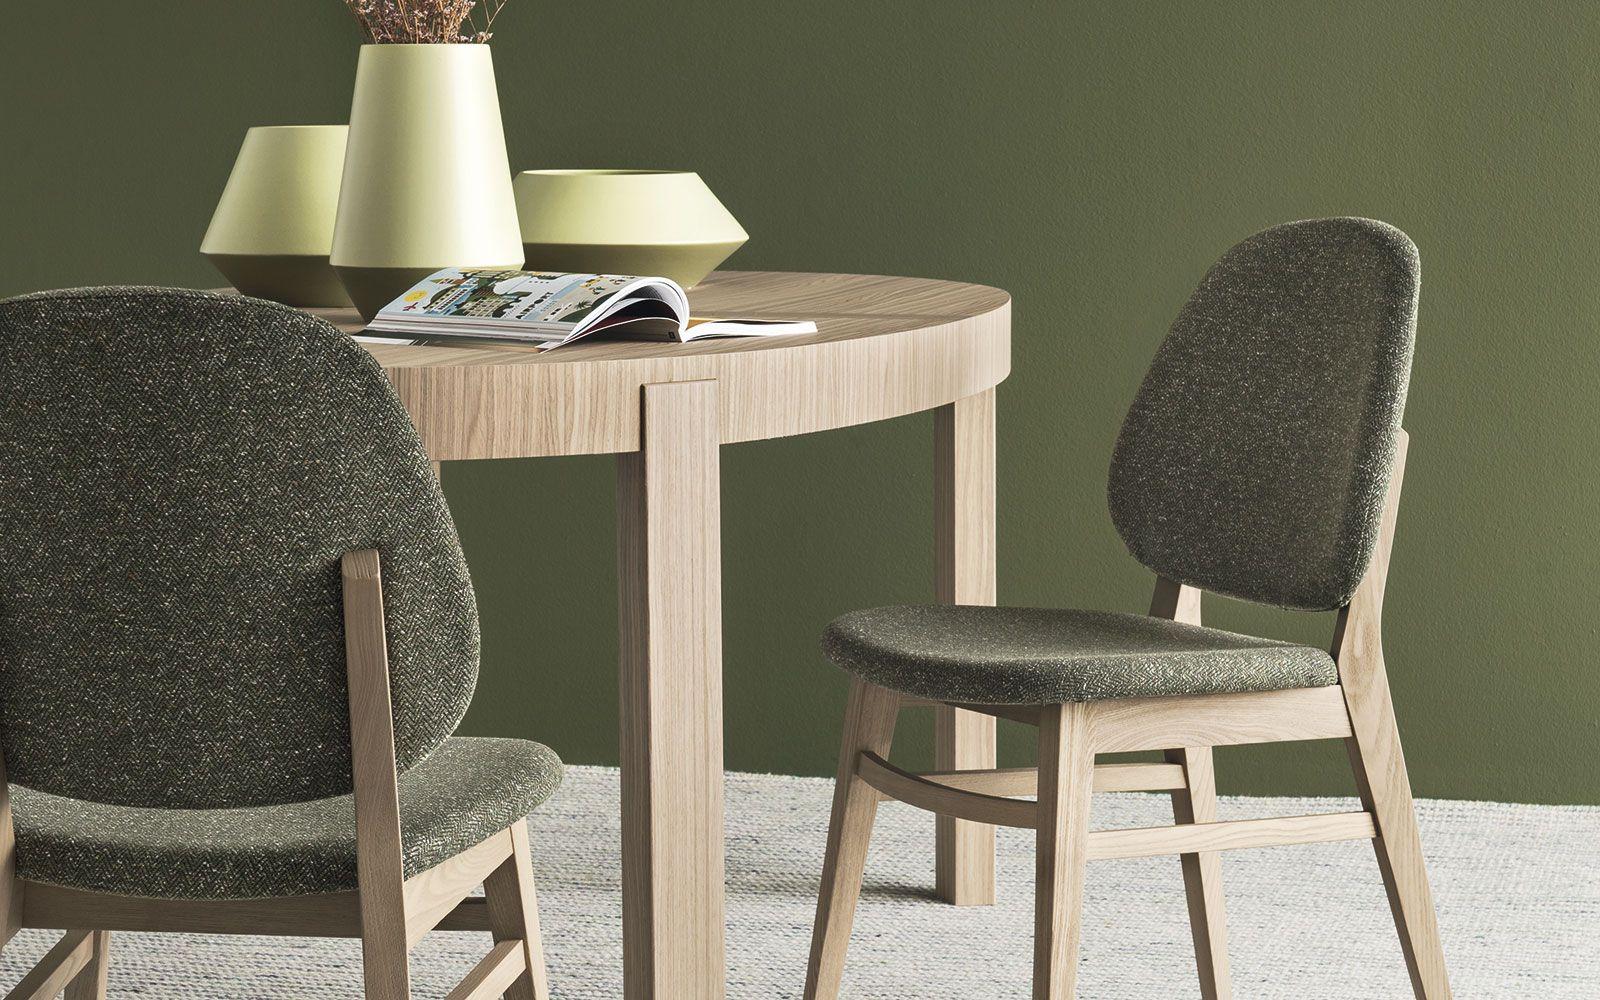 Callegari sedie ~ Sedia colette di calligaris sedie moderne sedie